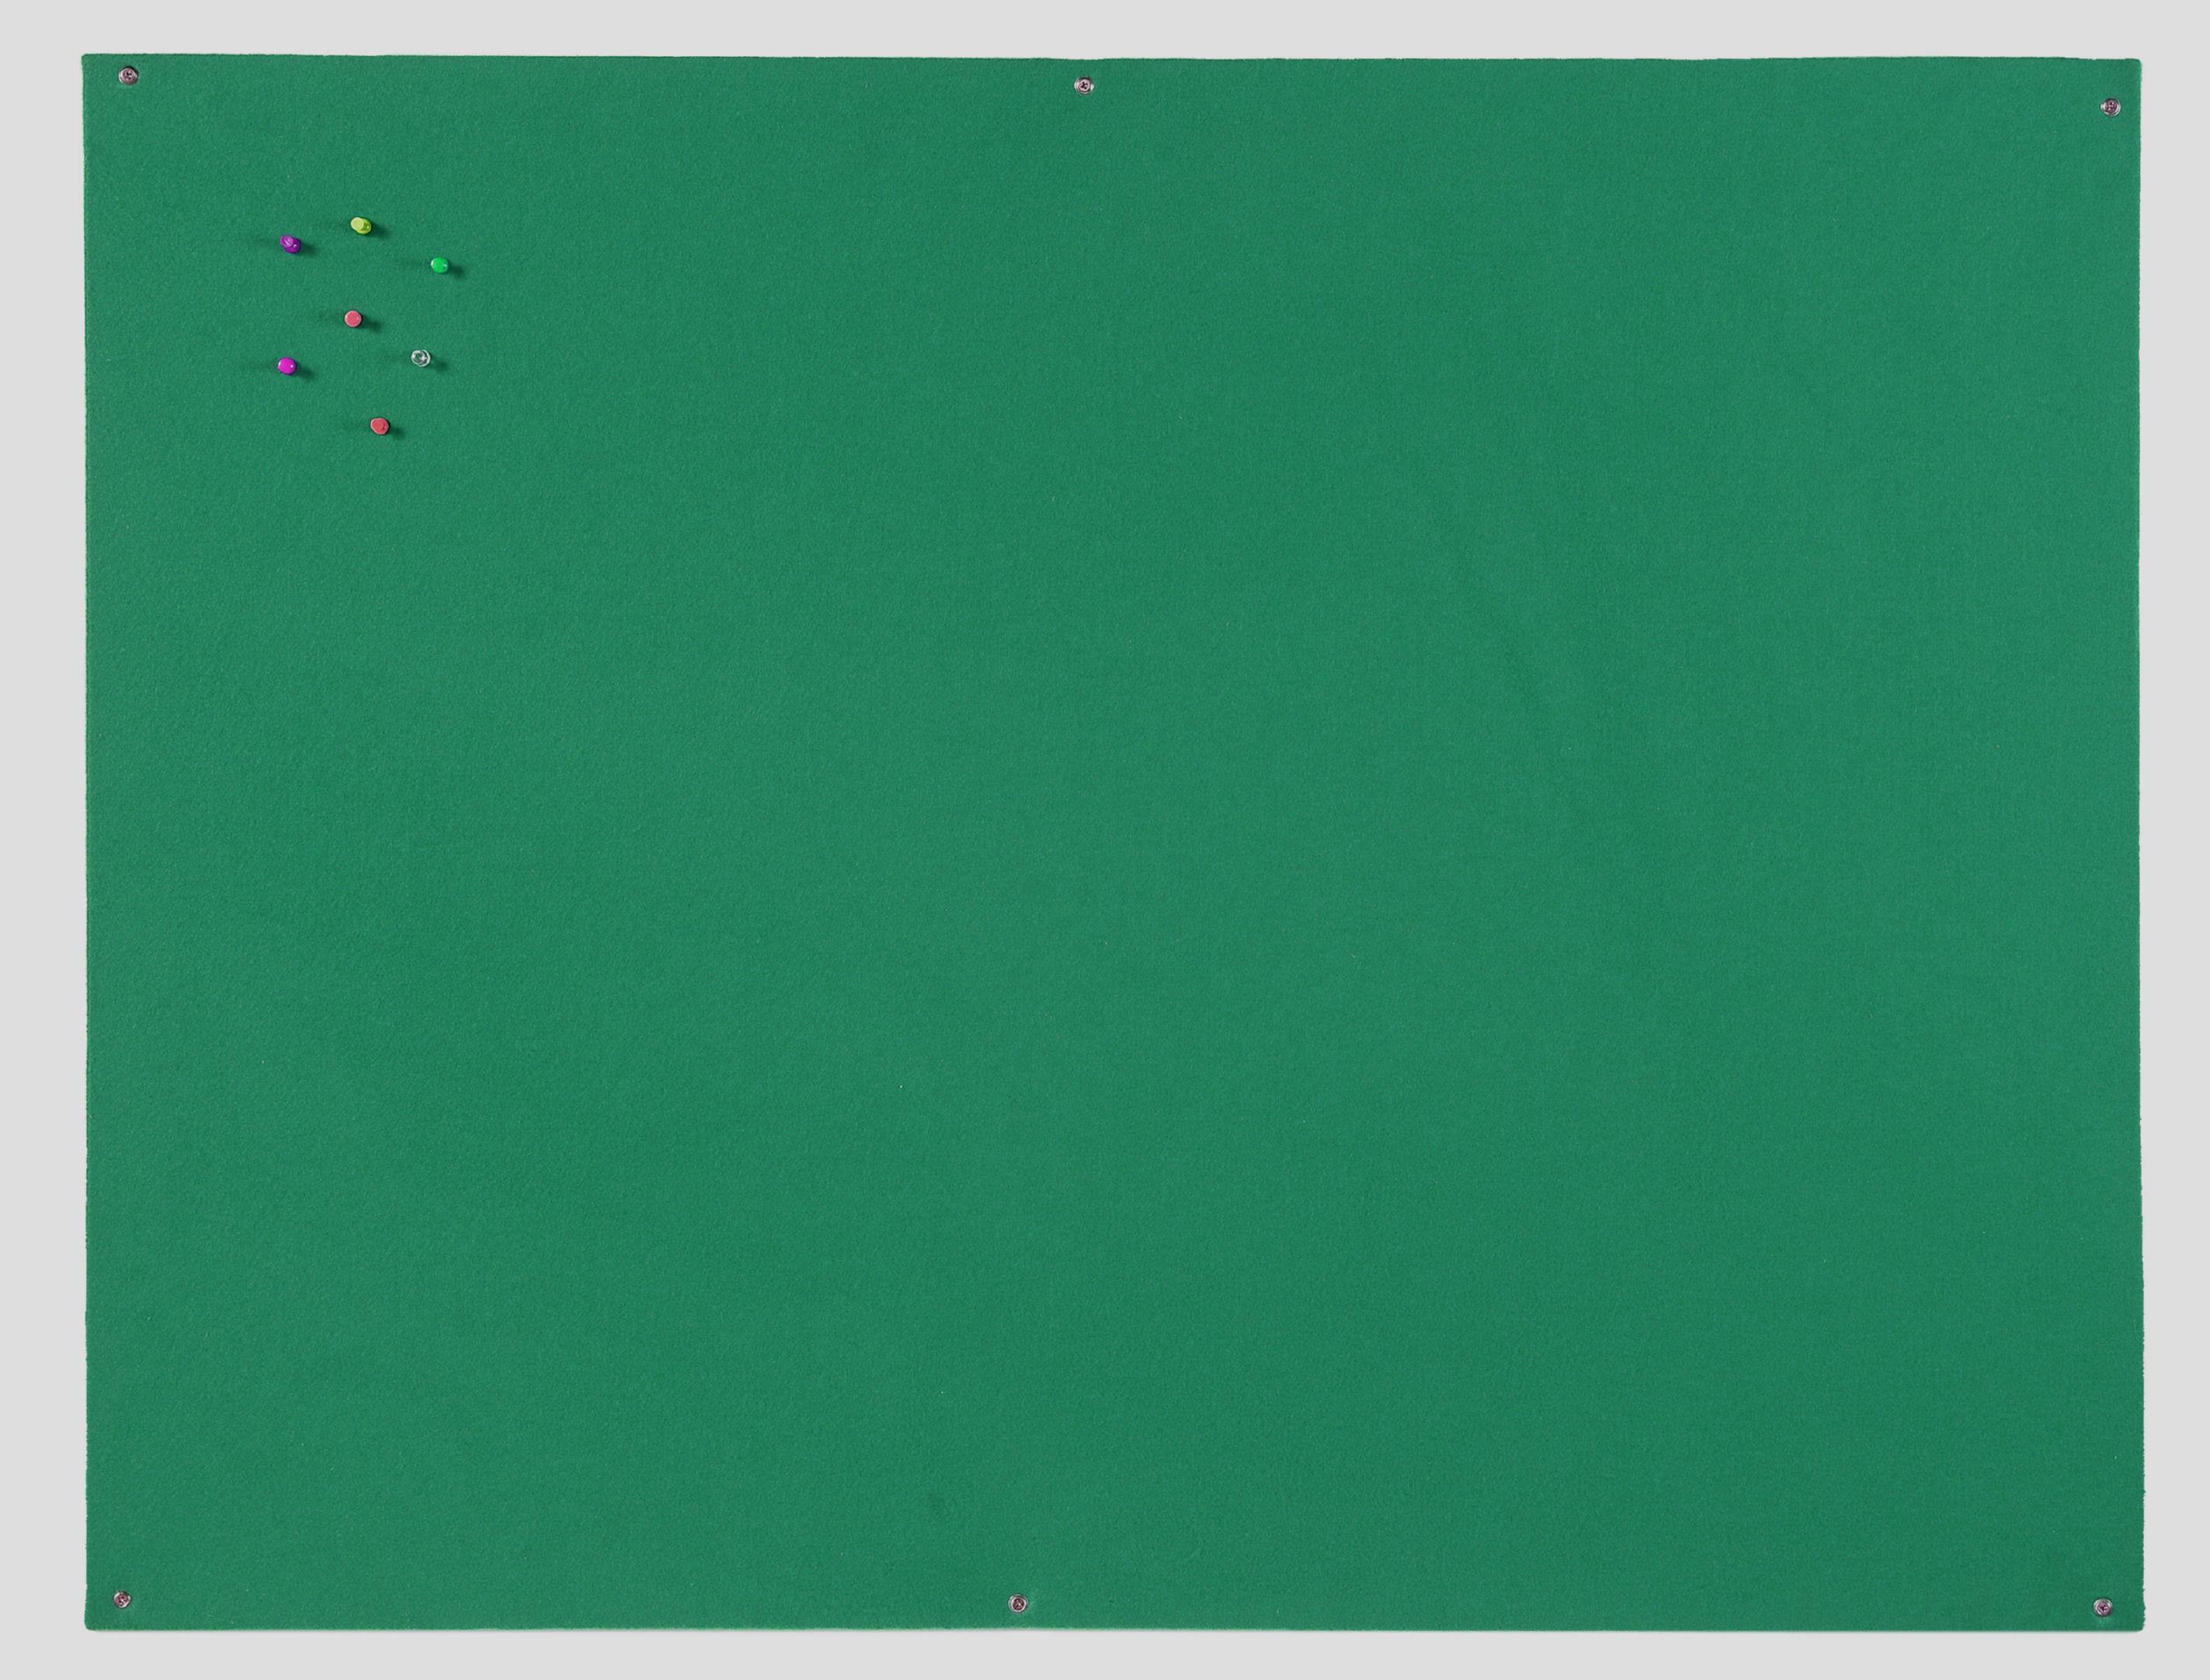 Felt Bi-Office Green Felt Noticeboard Unframed 1200x900mm